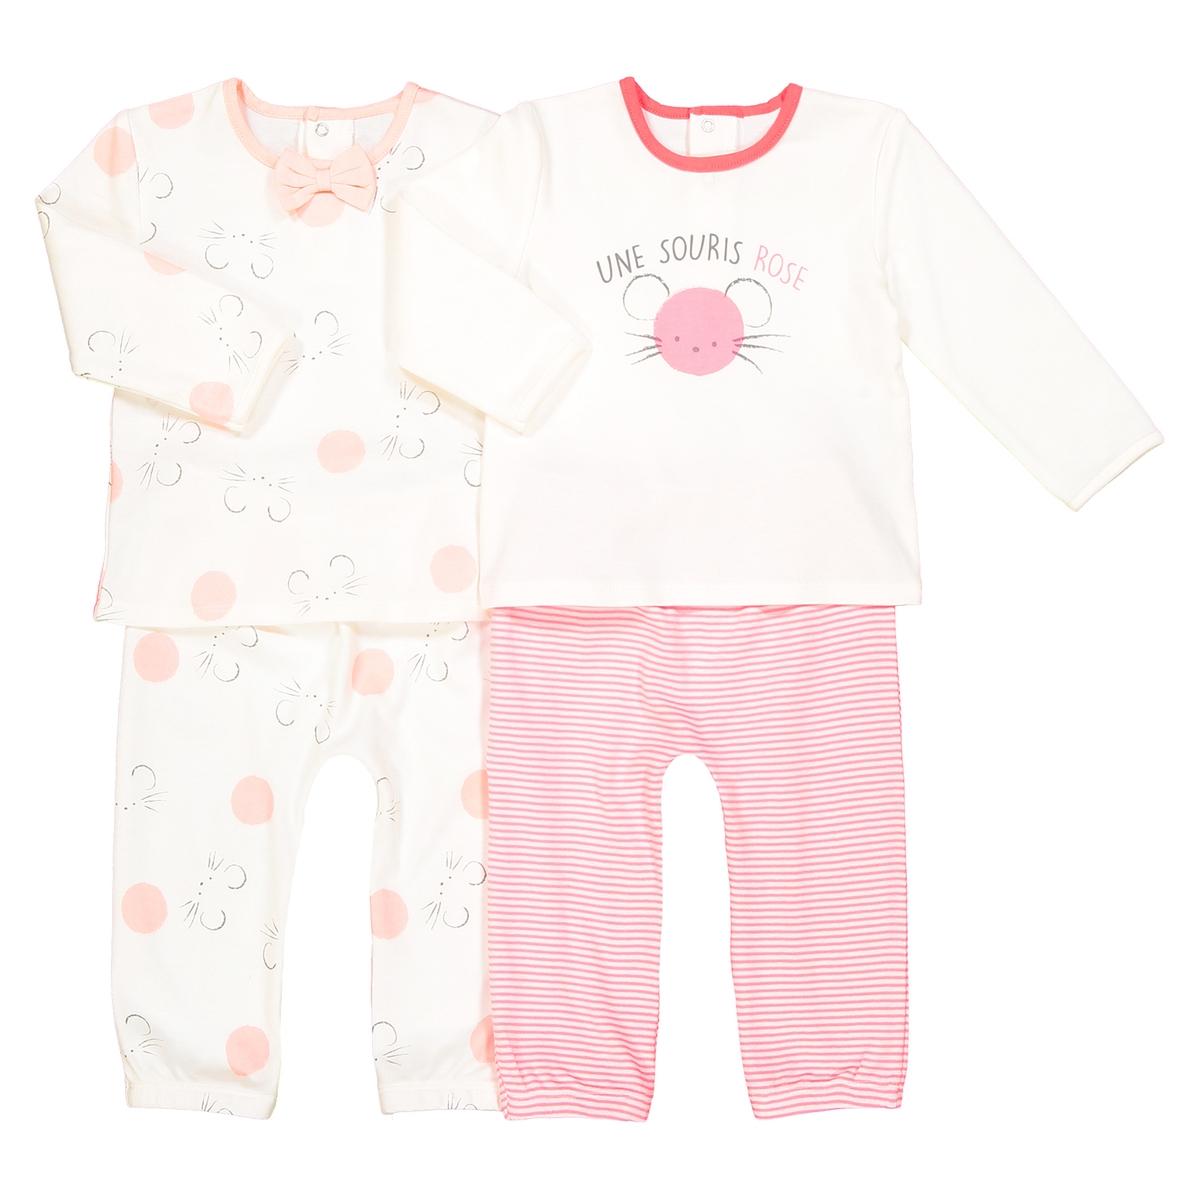 Confezione da 2 pigiama fantasia da 0 mesi a 3 anni